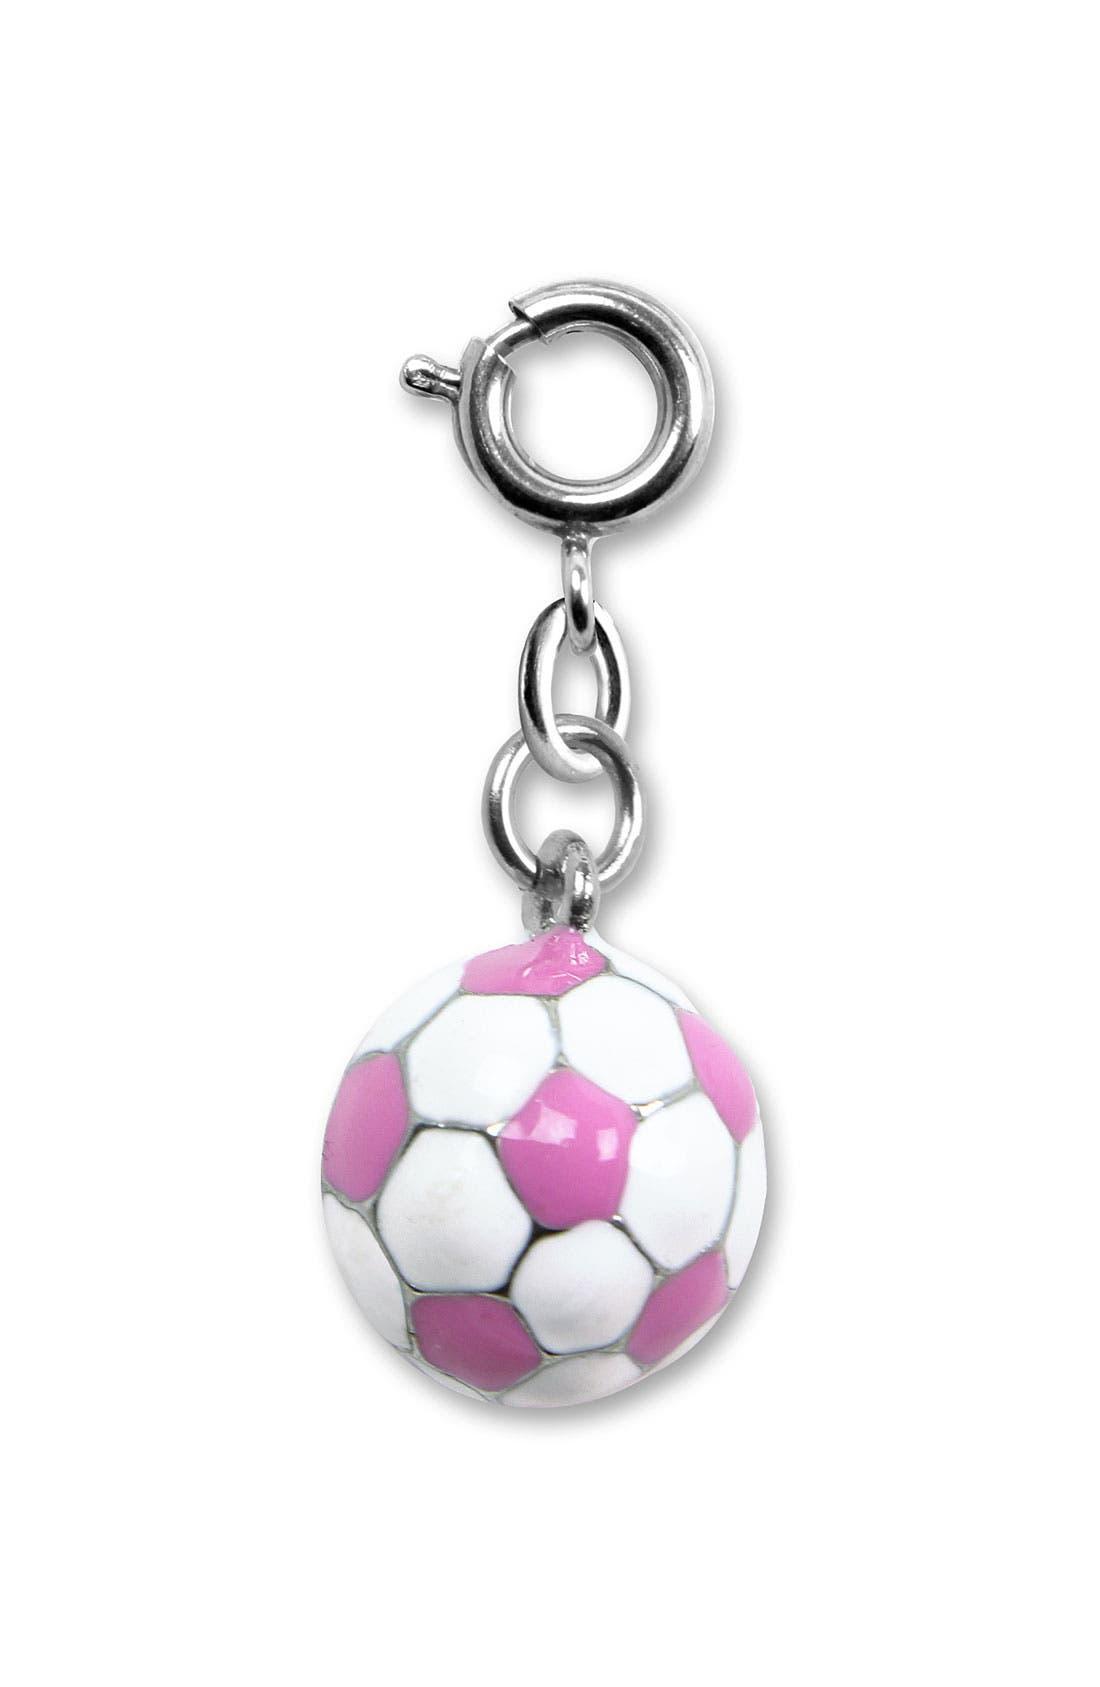 Main Image - CHARM IT!® 'Soccer Ball' Charm (Girls)